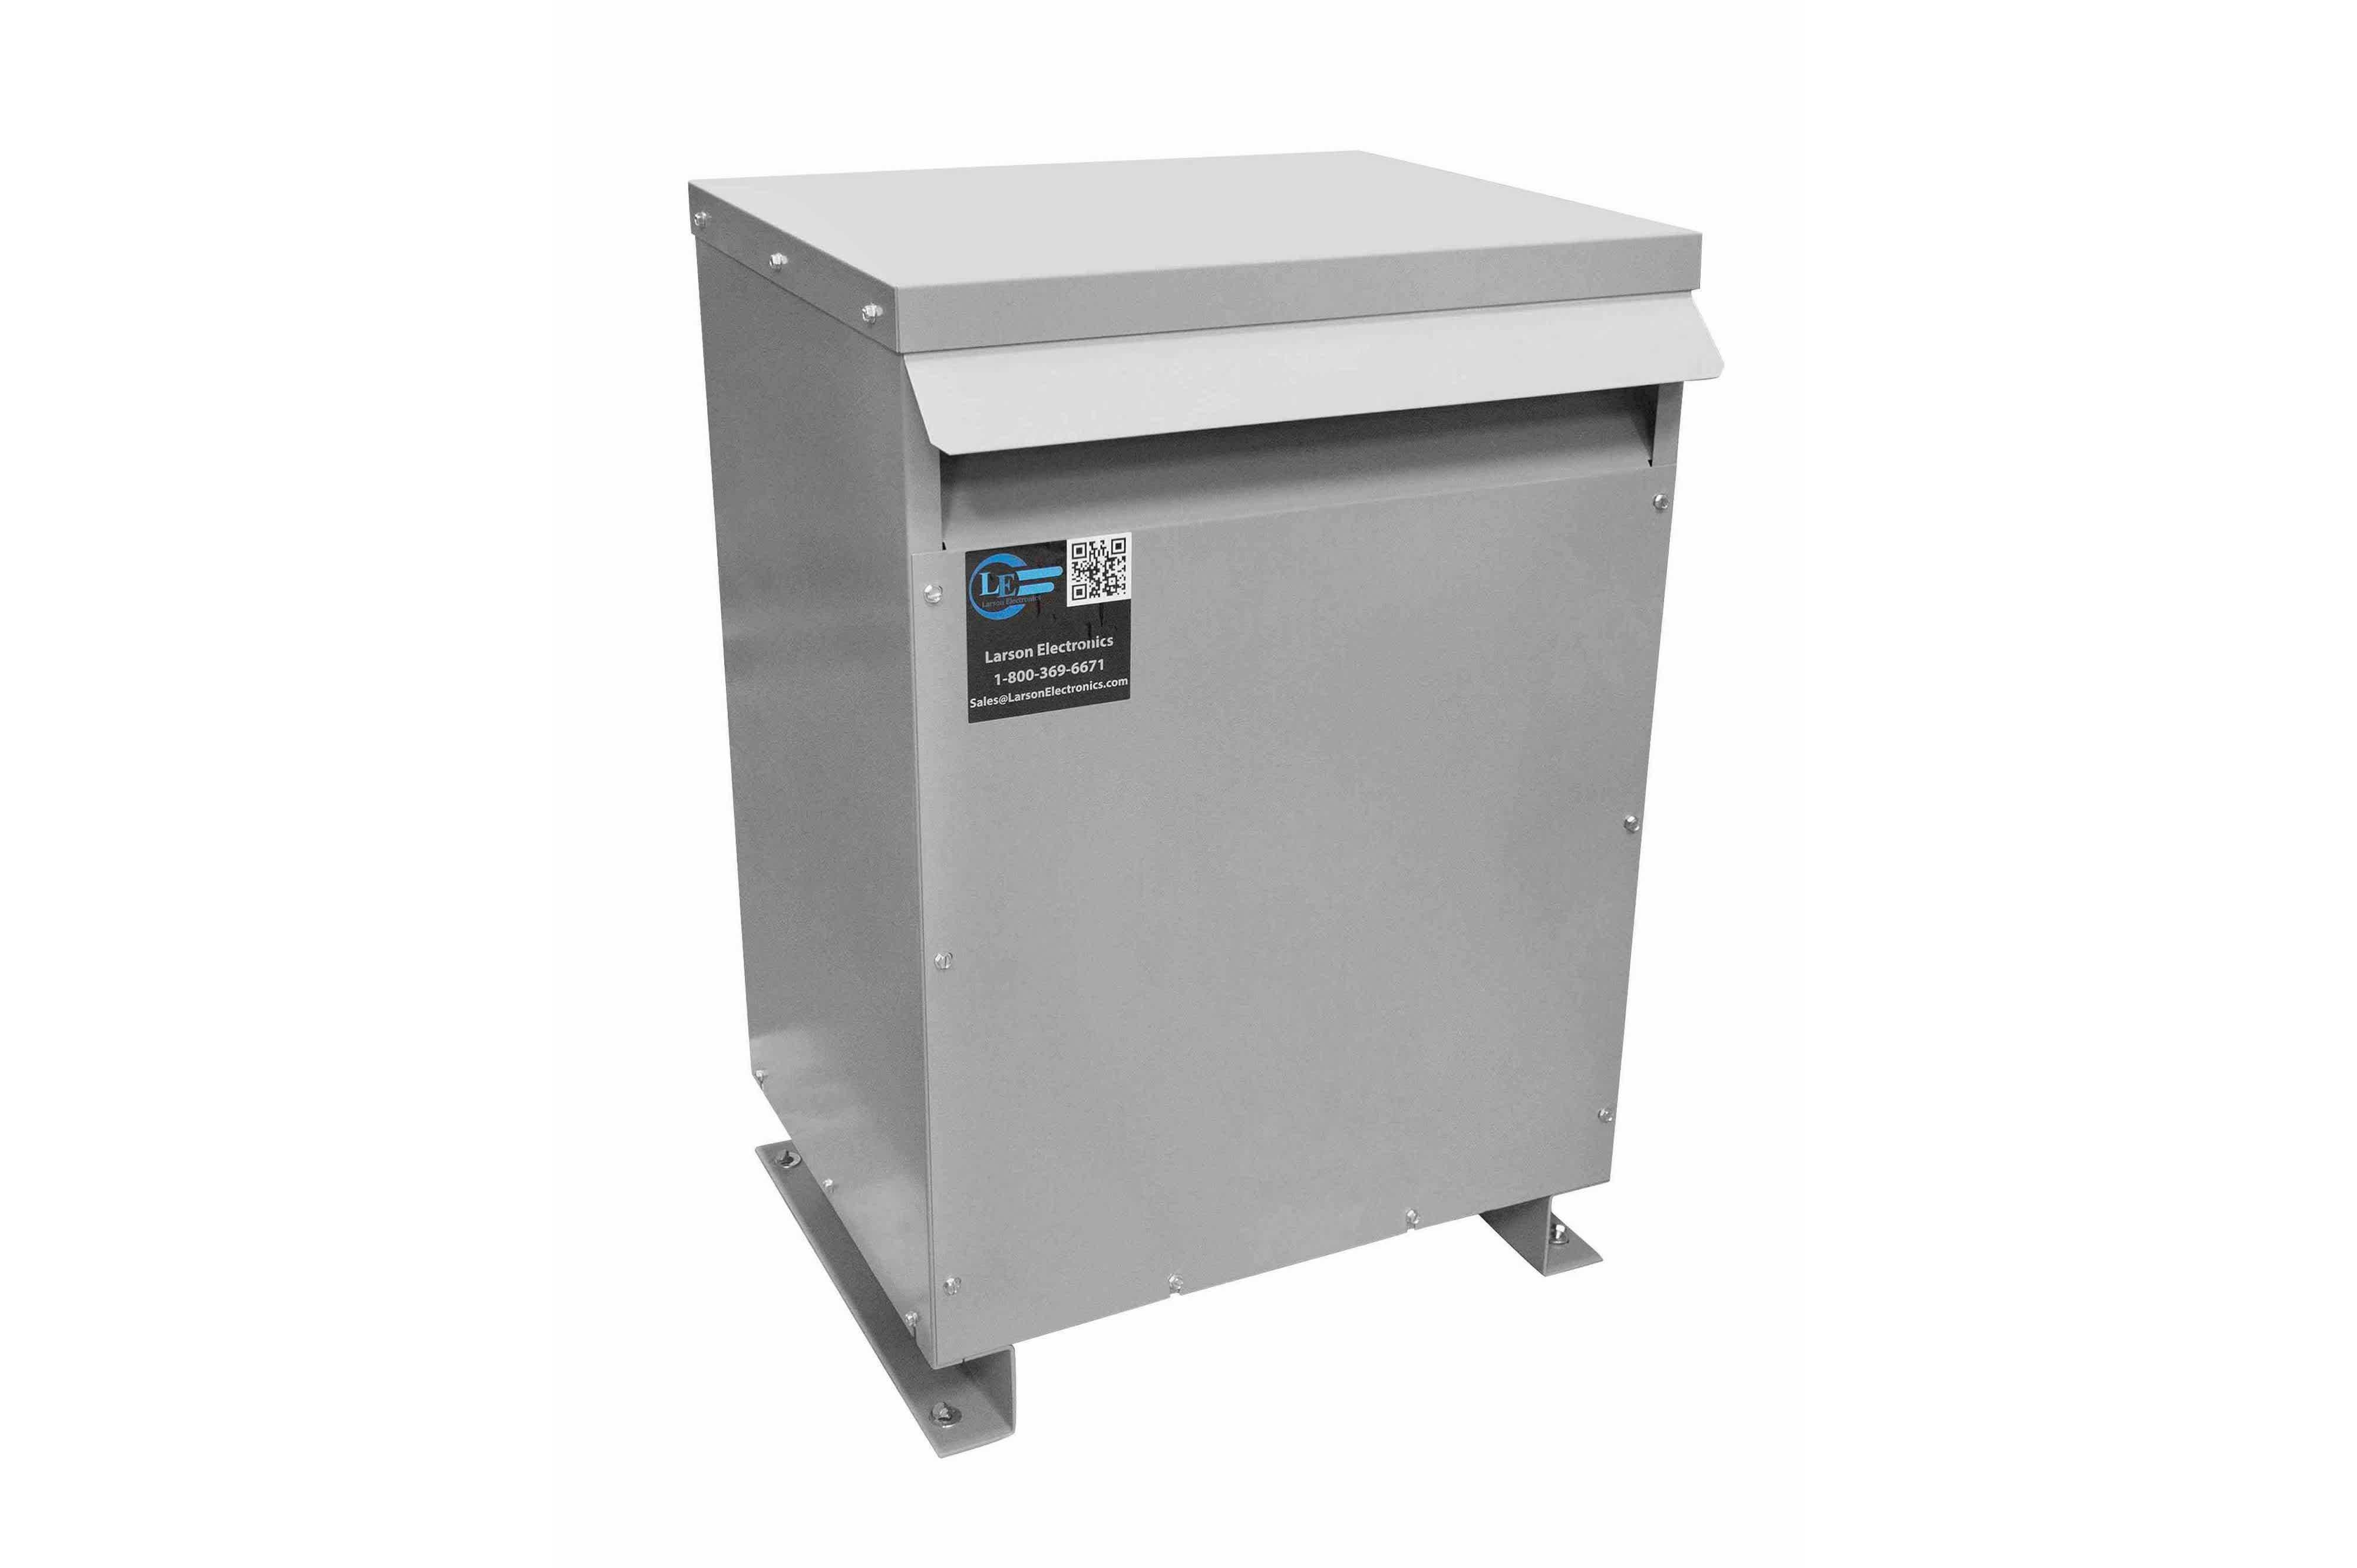 90 kVA 3PH Isolation Transformer, 400V Wye Primary, 600V Delta Secondary, N3R, Ventilated, 60 Hz